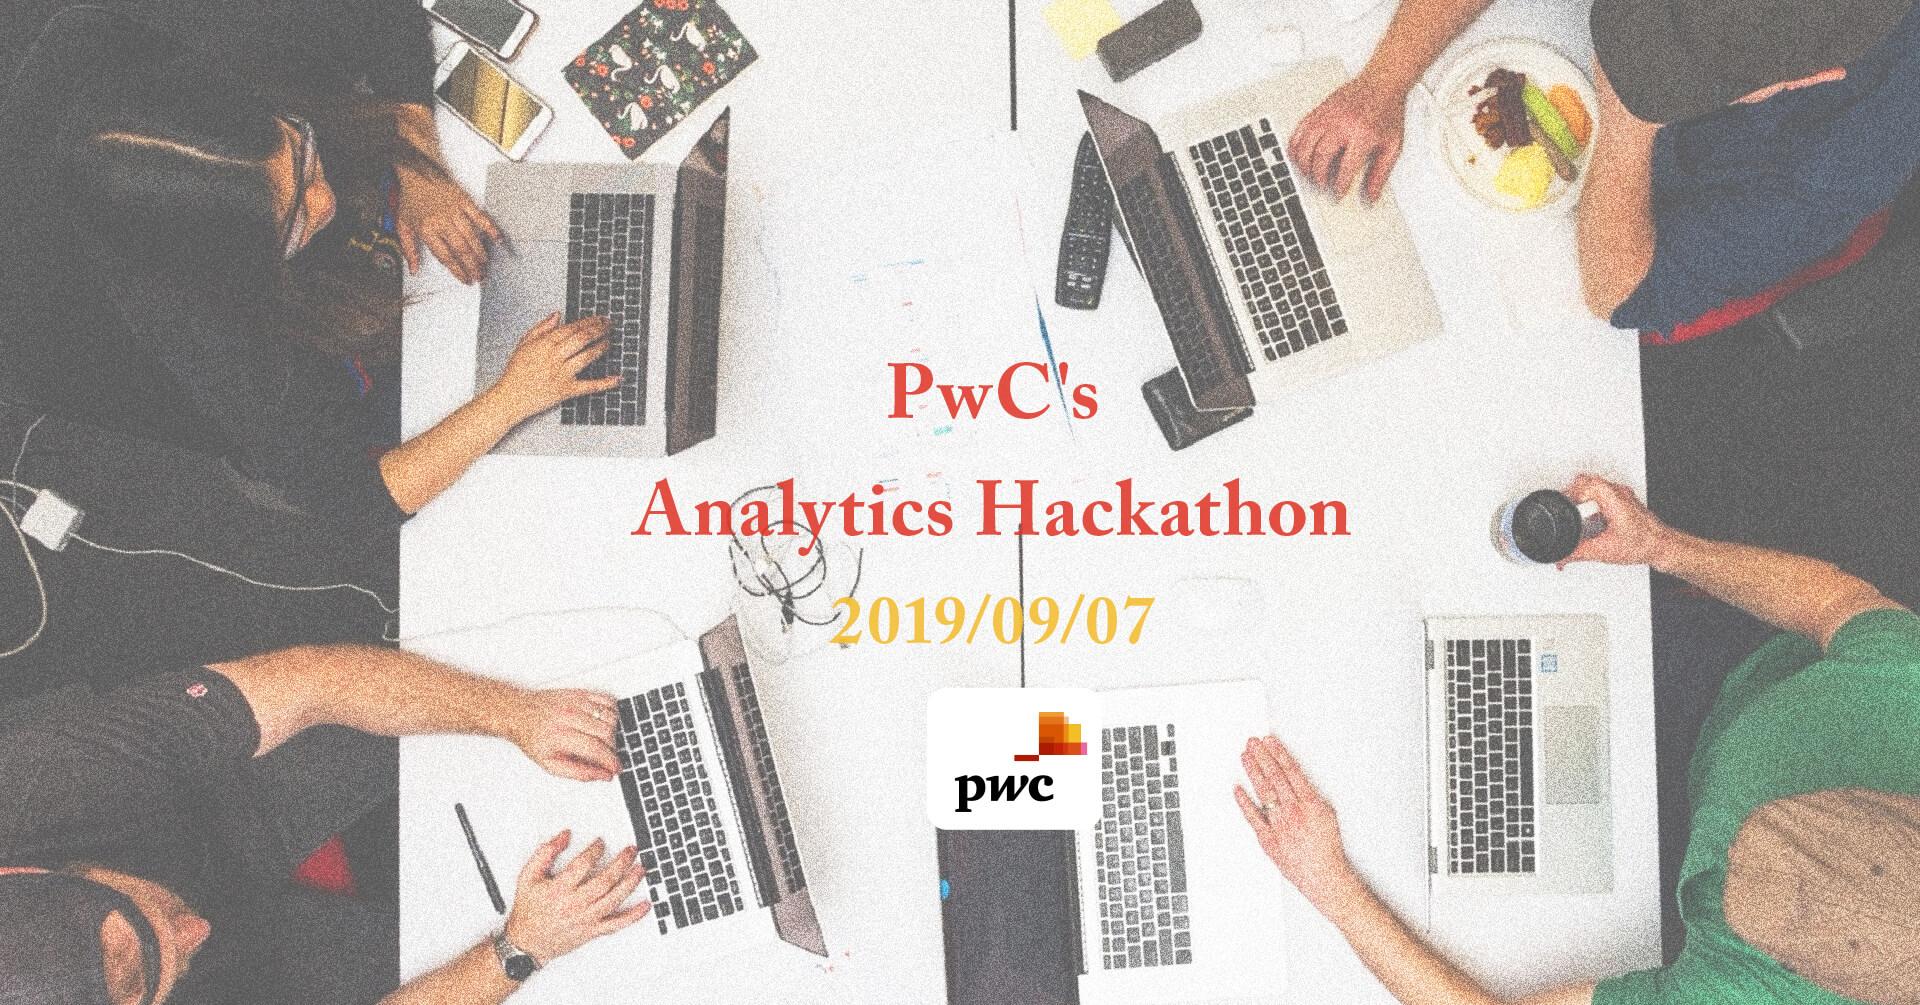 PwC's Analytics Hackathon